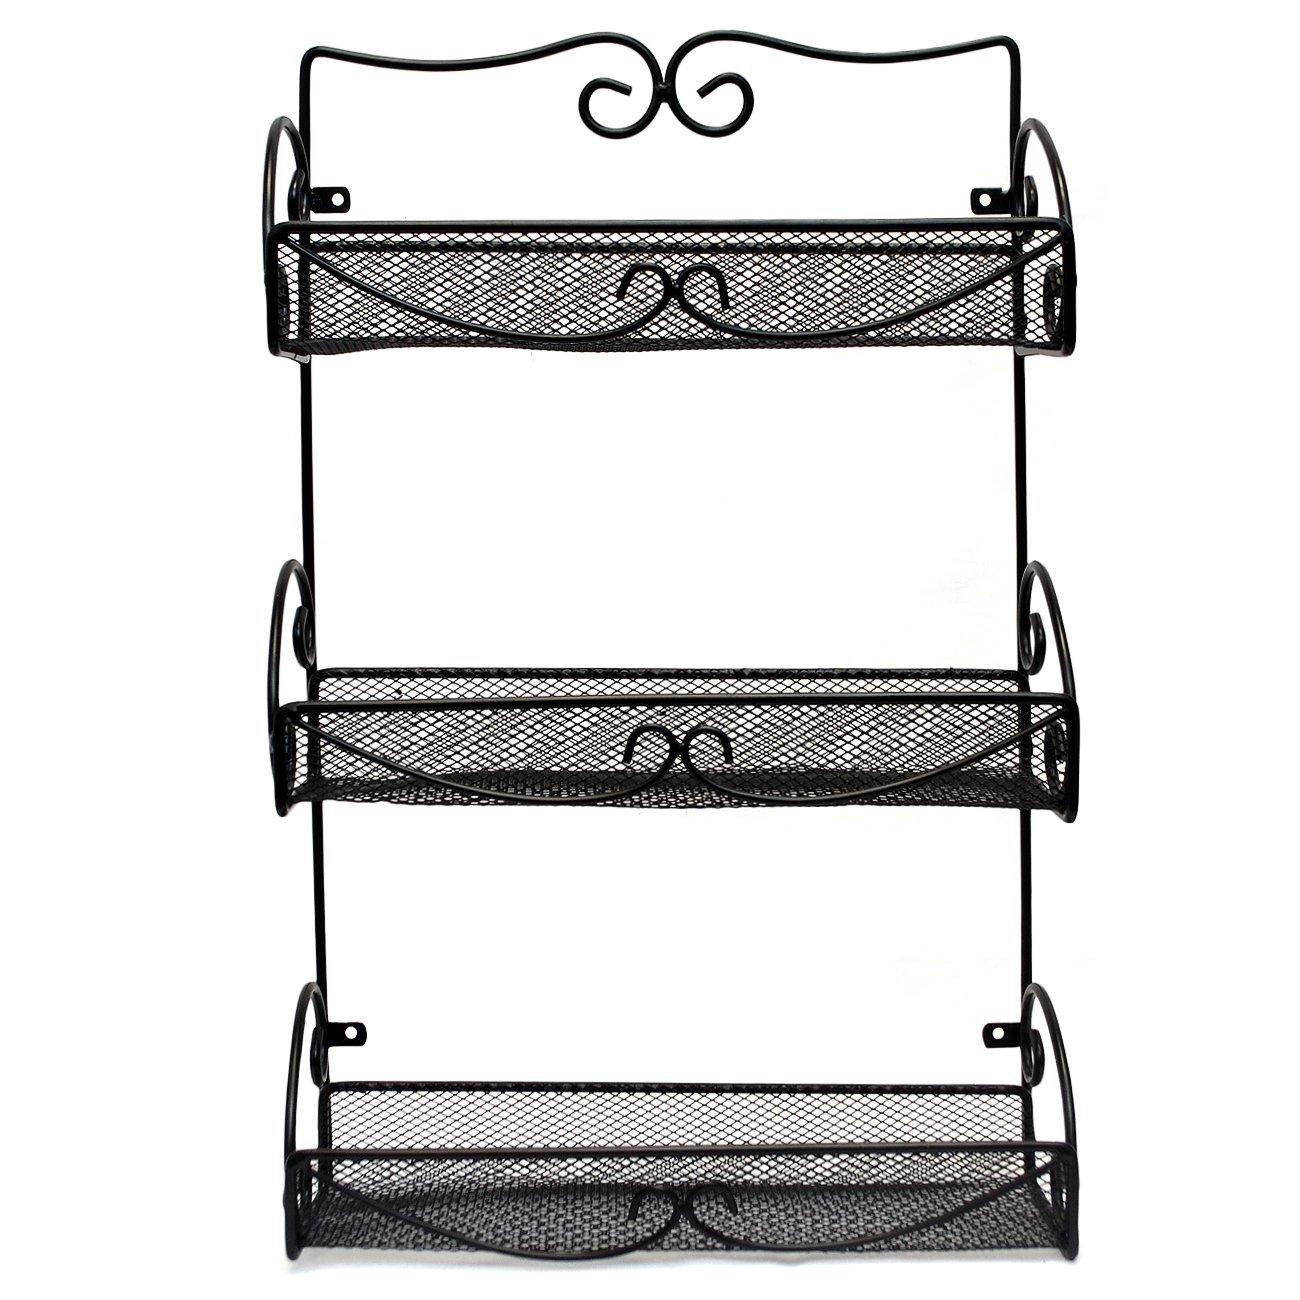 Sorbus® Spice Rack and Multi-Purpose Organizer – 3 Tier Wall Mounted Storage Rack